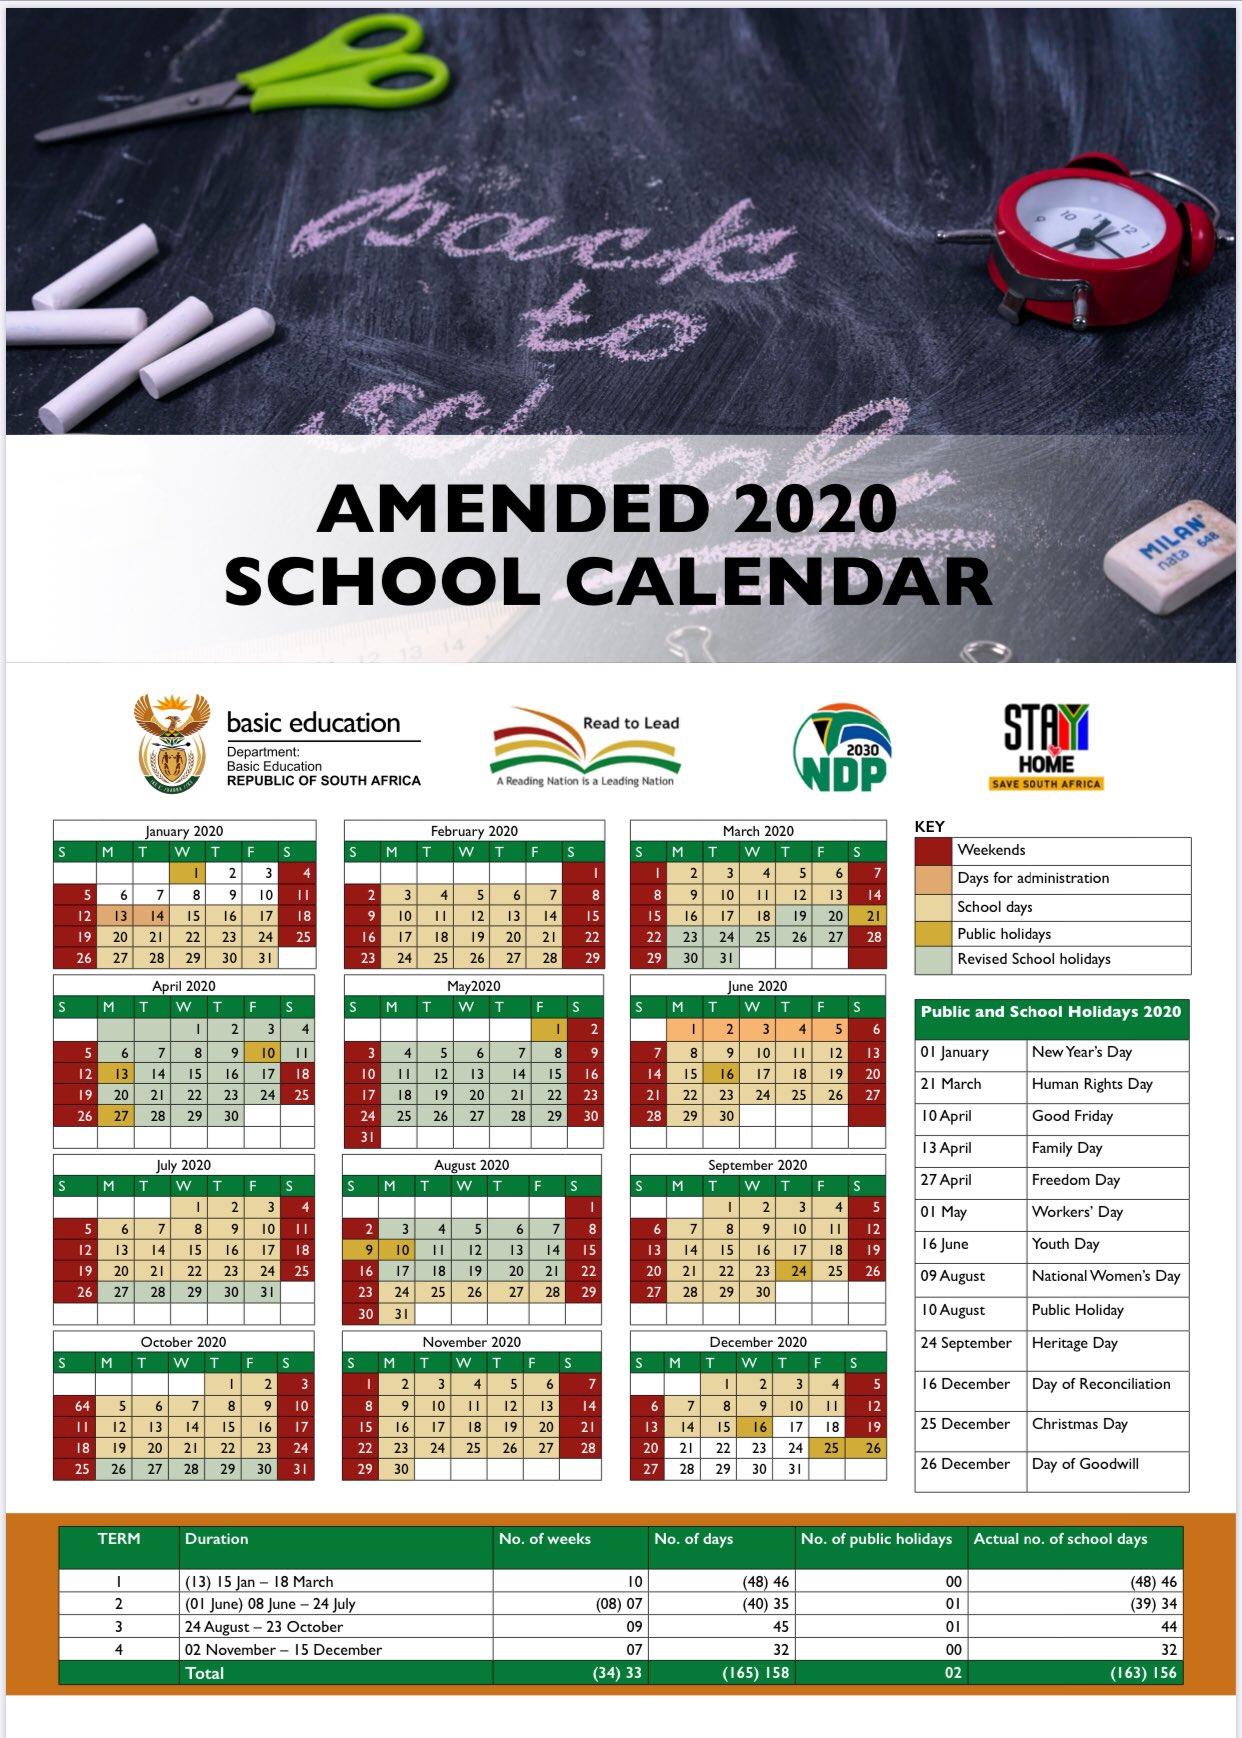 Revised School Calendar 2020